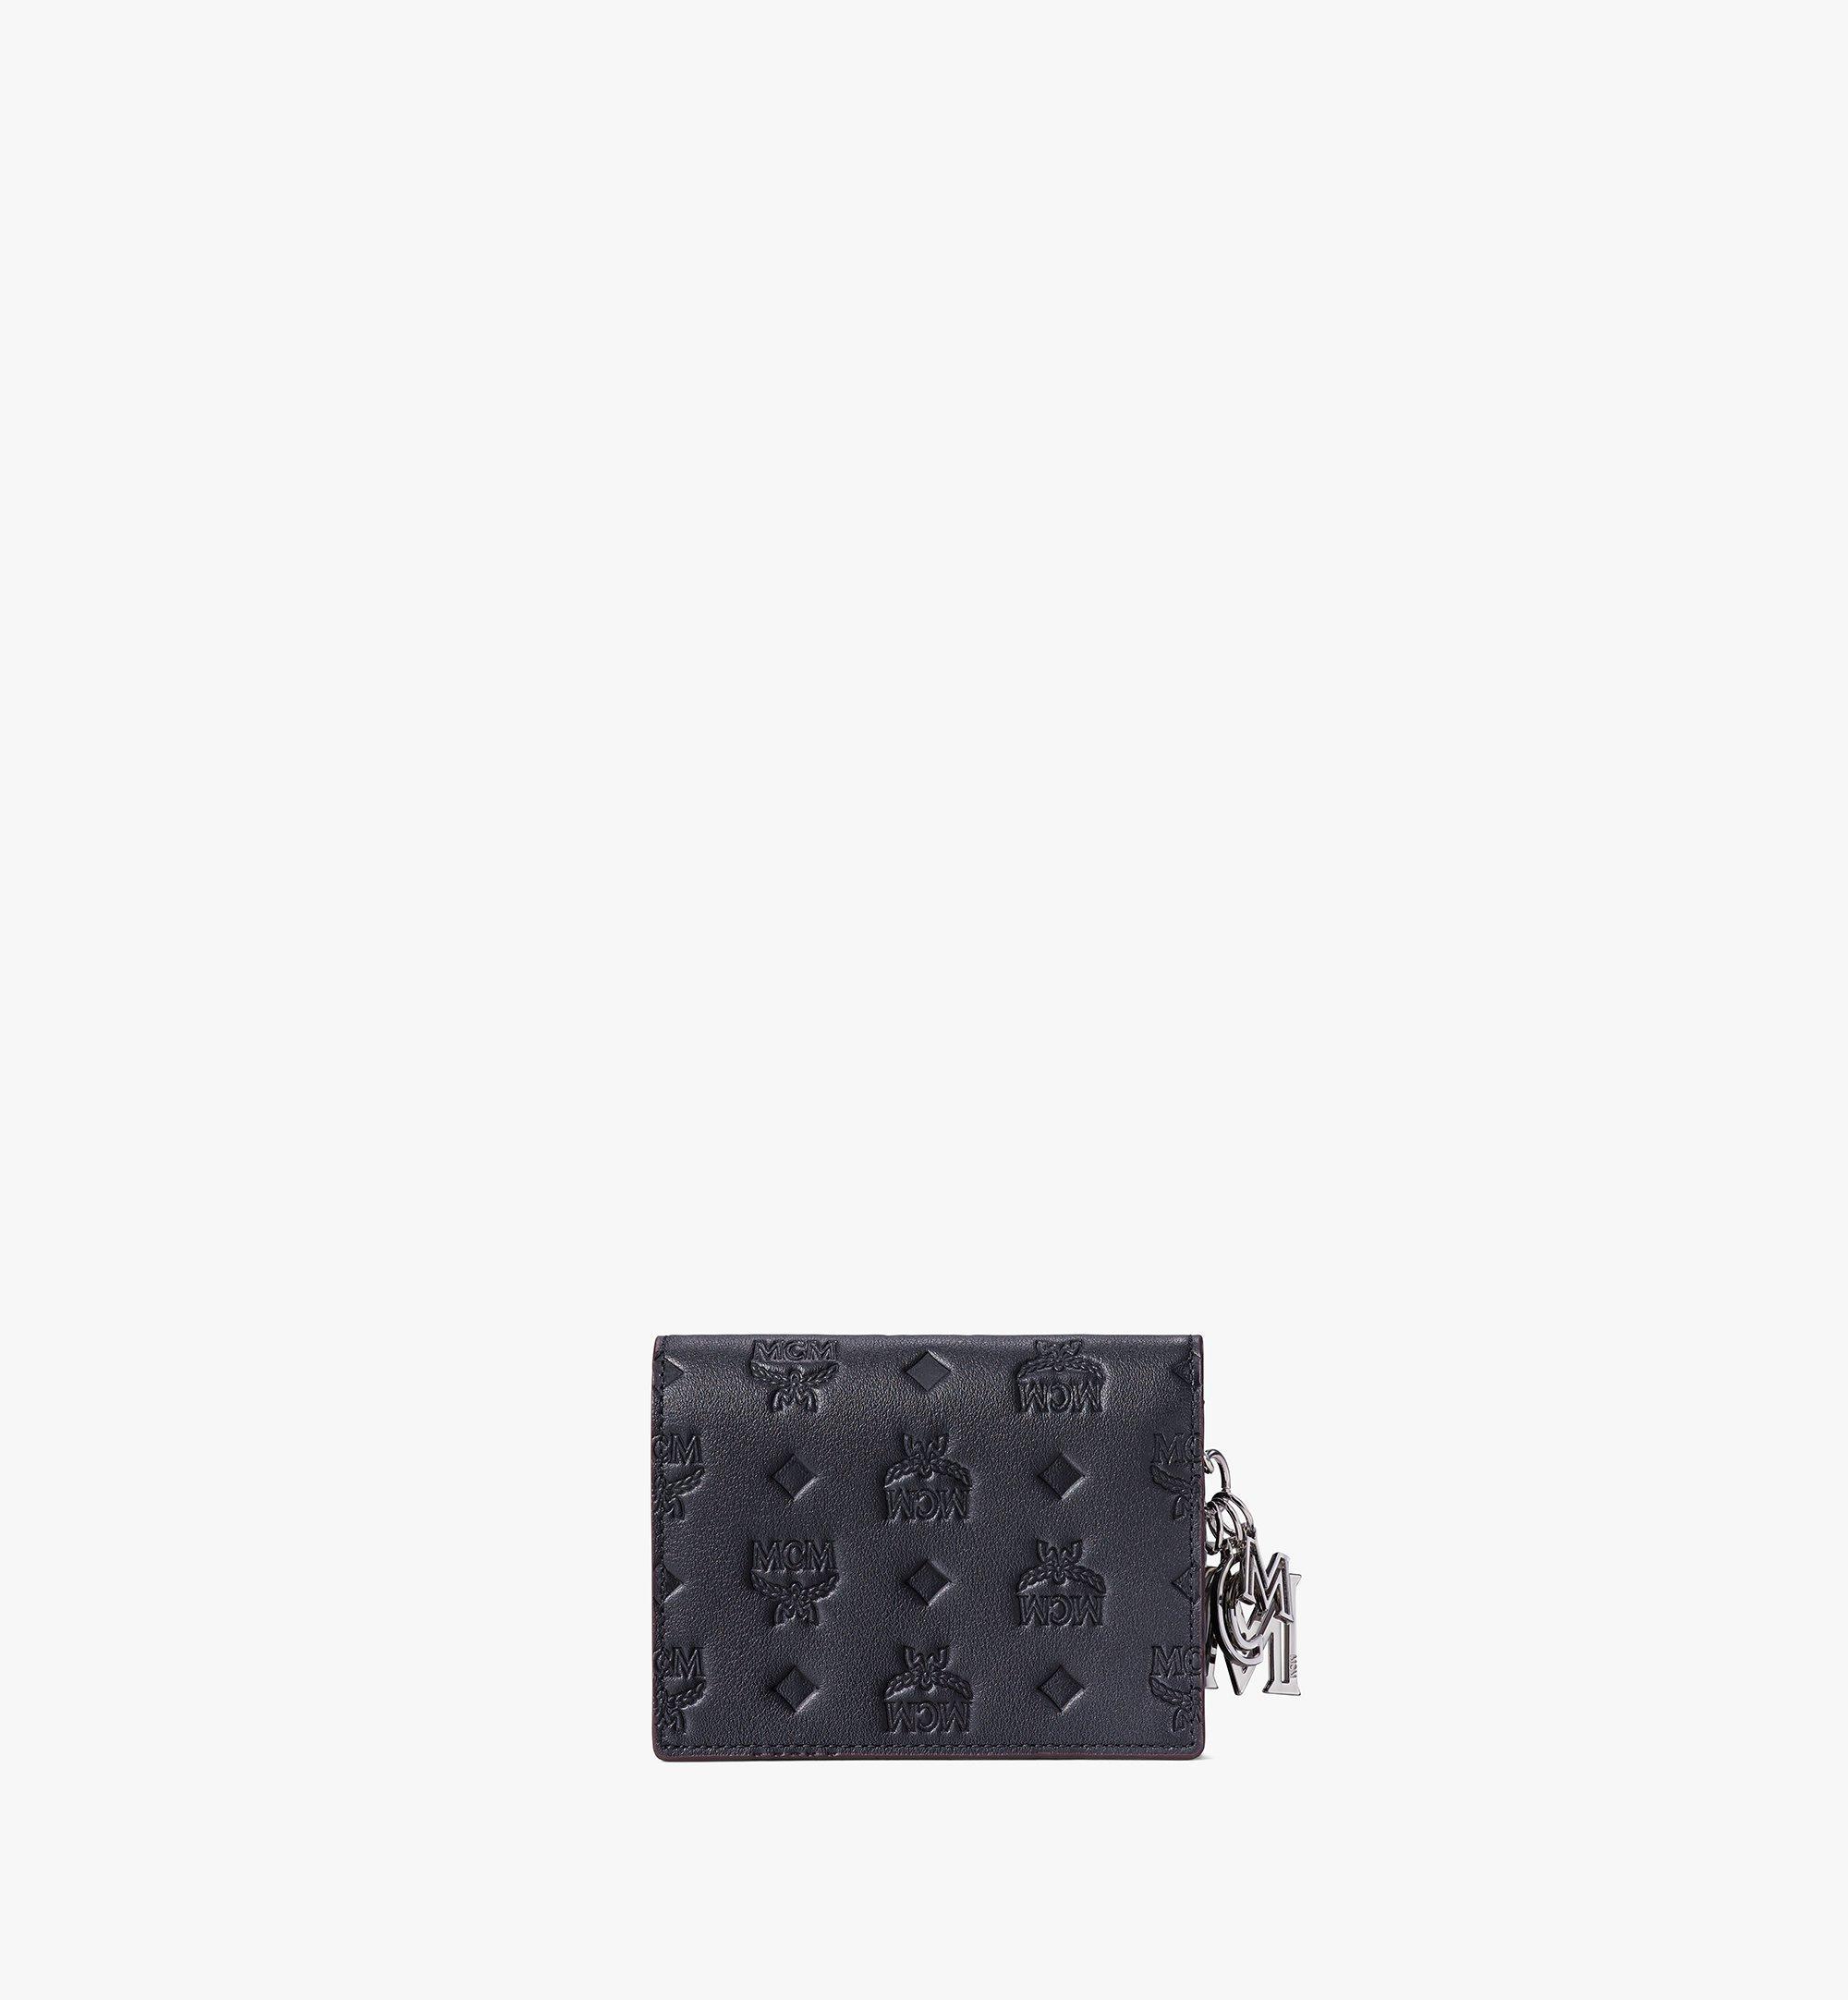 MCM Klara Chain Wallet in Monogram Leather Black MYLAAKM02BK001 Alternate View 2